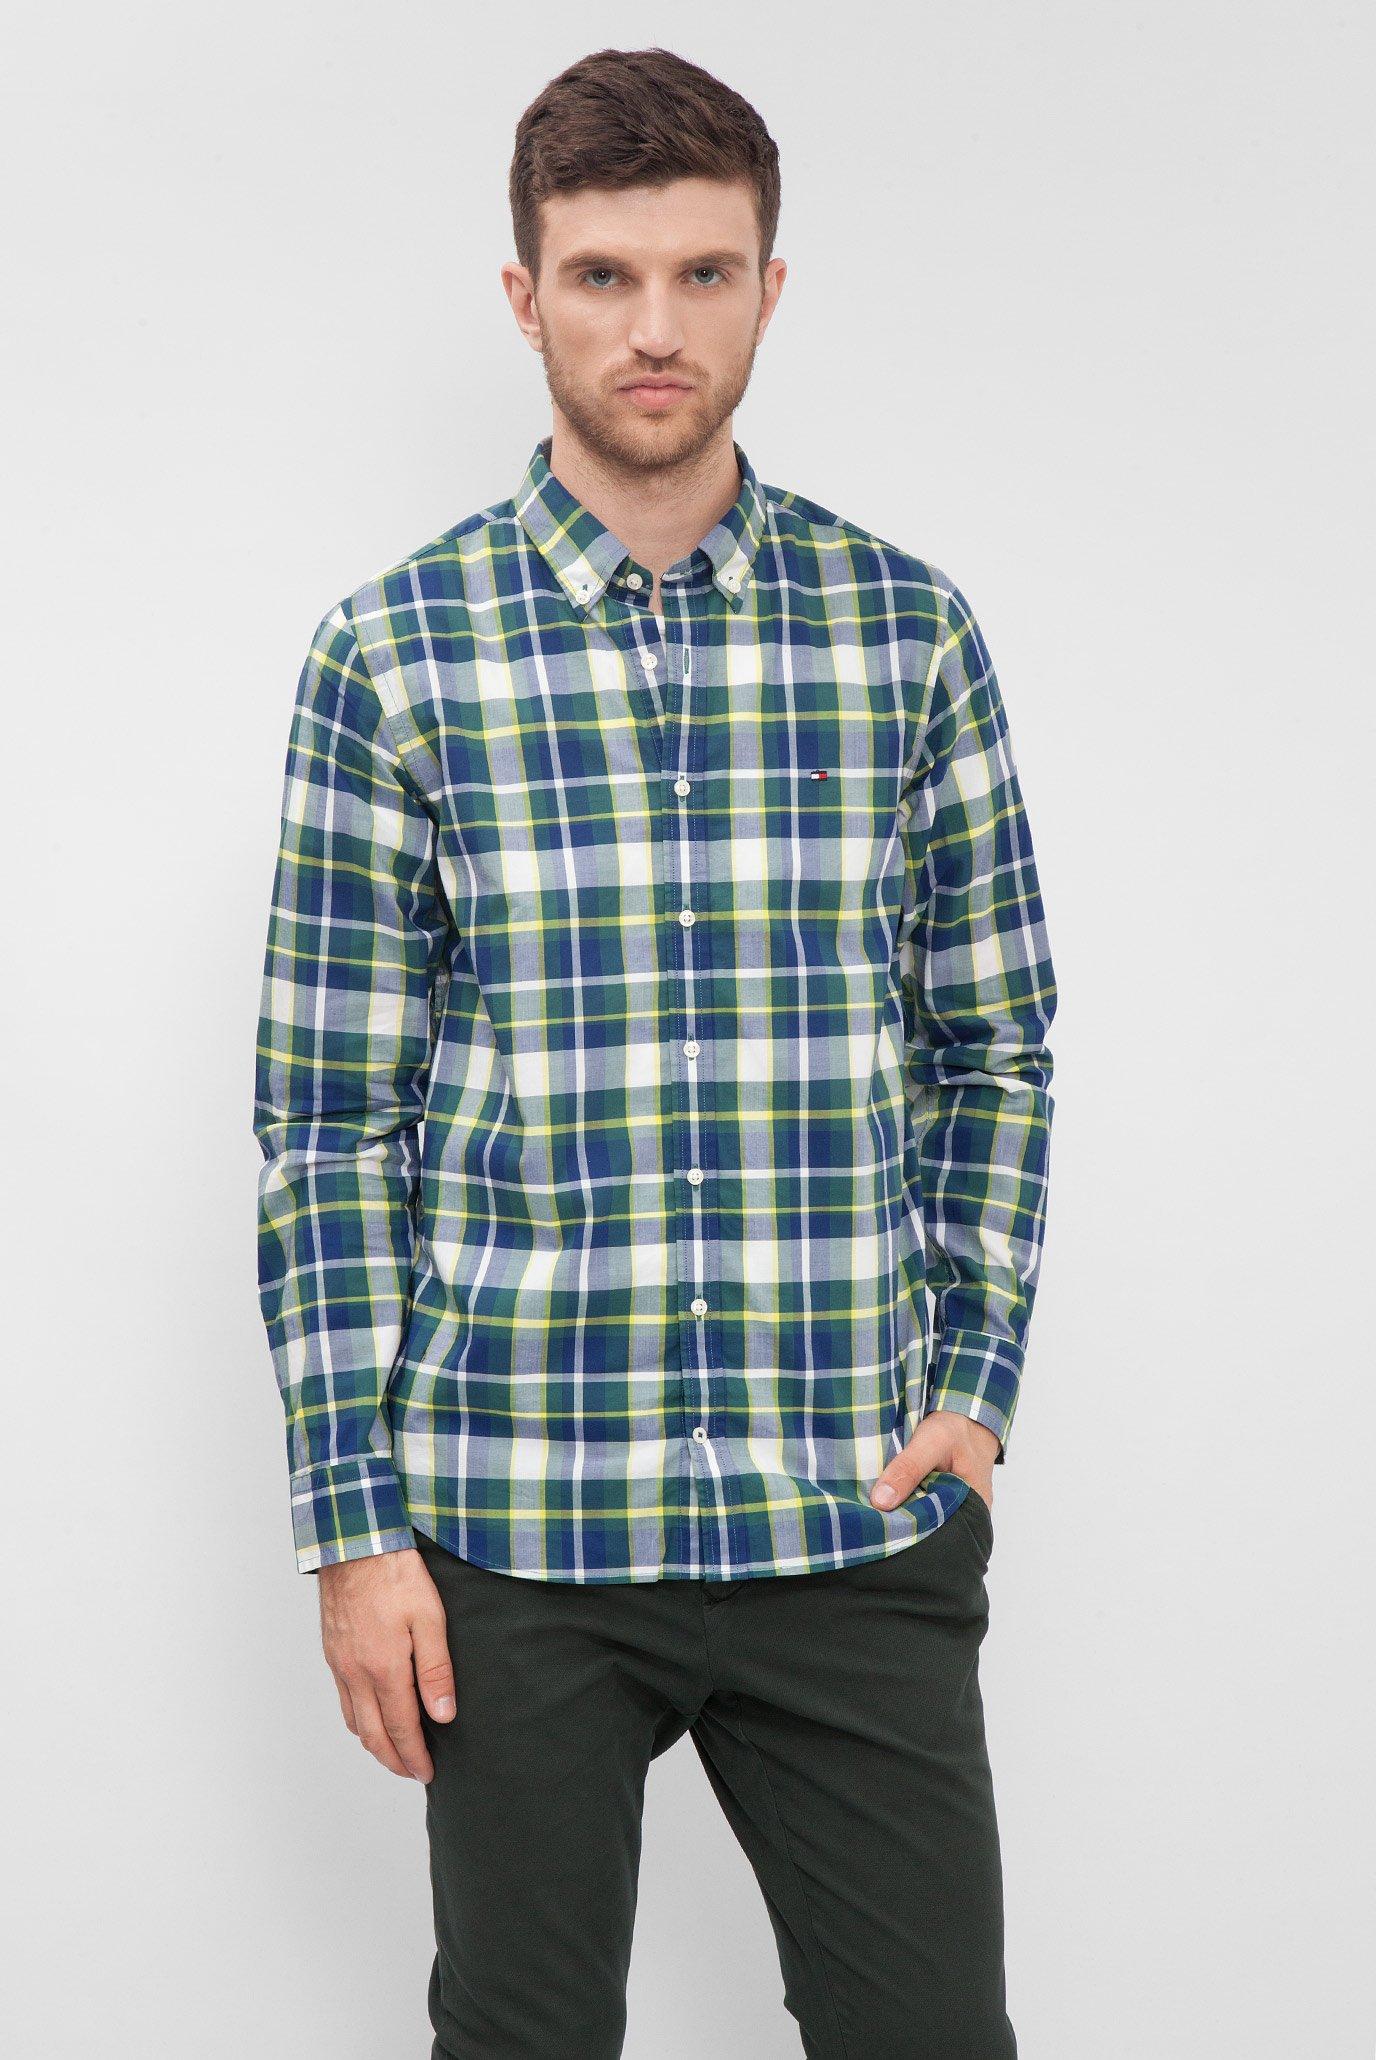 deffb8cb776 Купить Мужская рубашка в клетку Tommy Hilfiger Tommy Hilfiger MW0MW02935 –  Киев